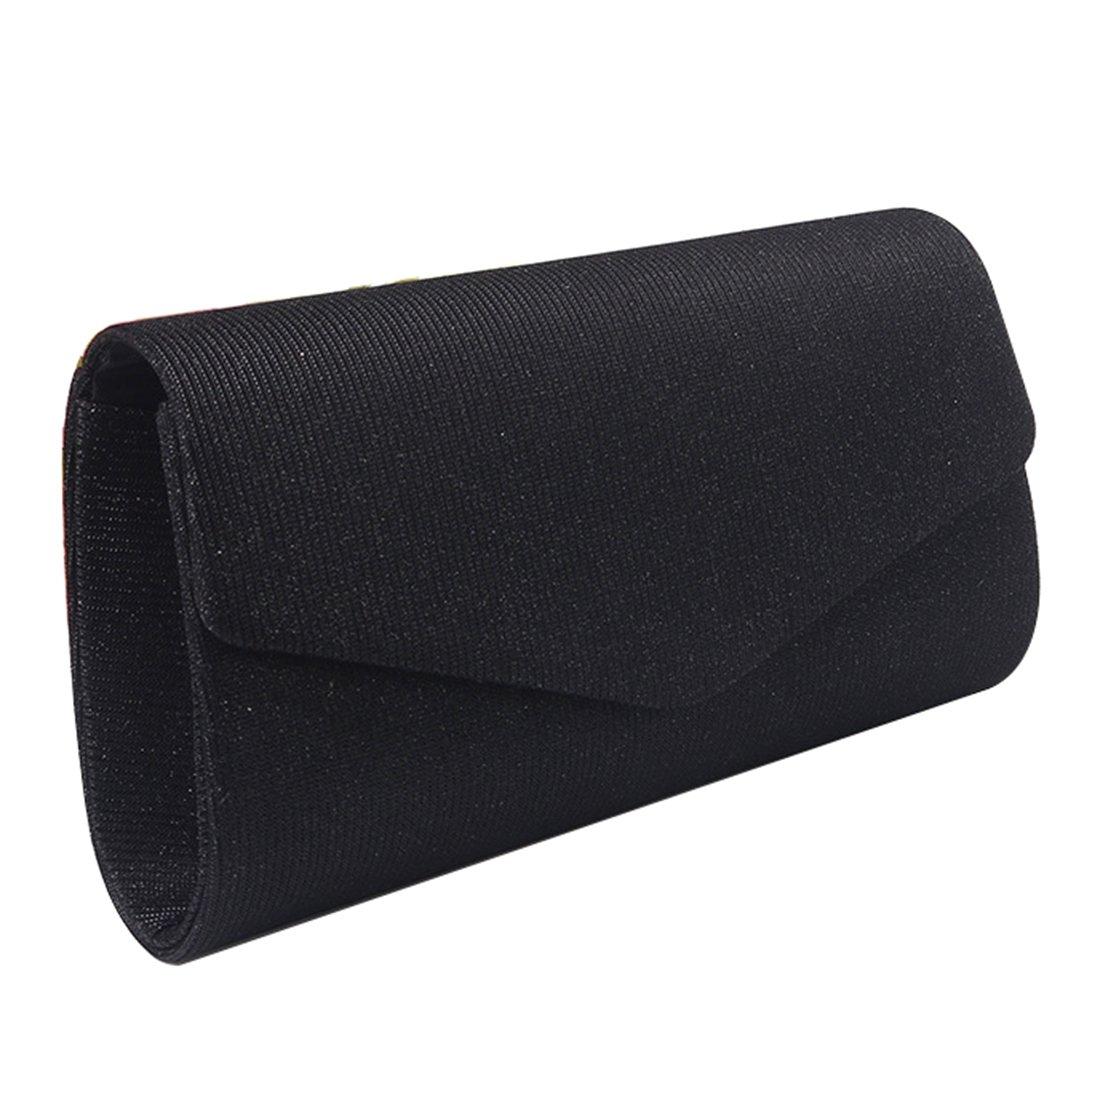 Satin Silk Evening Bags Elegant Envelope Flap Clutch Purse Handbag for Women (Black)